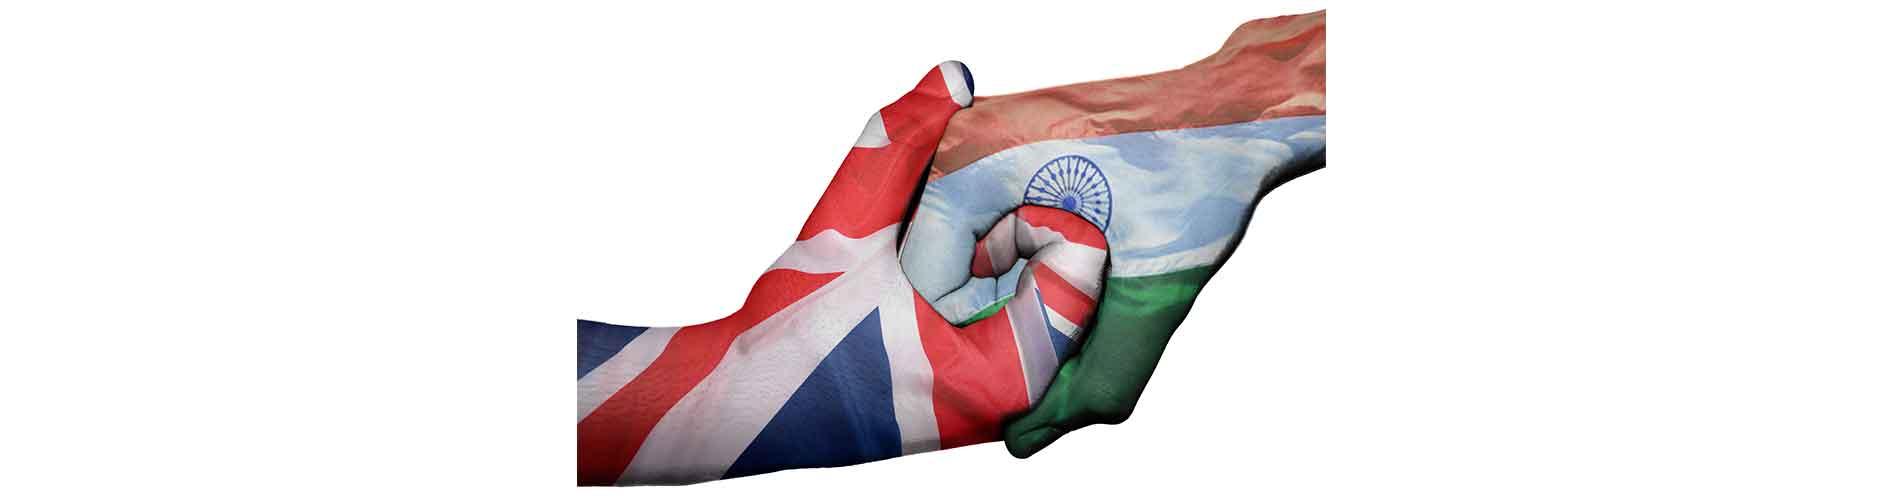 india uk company